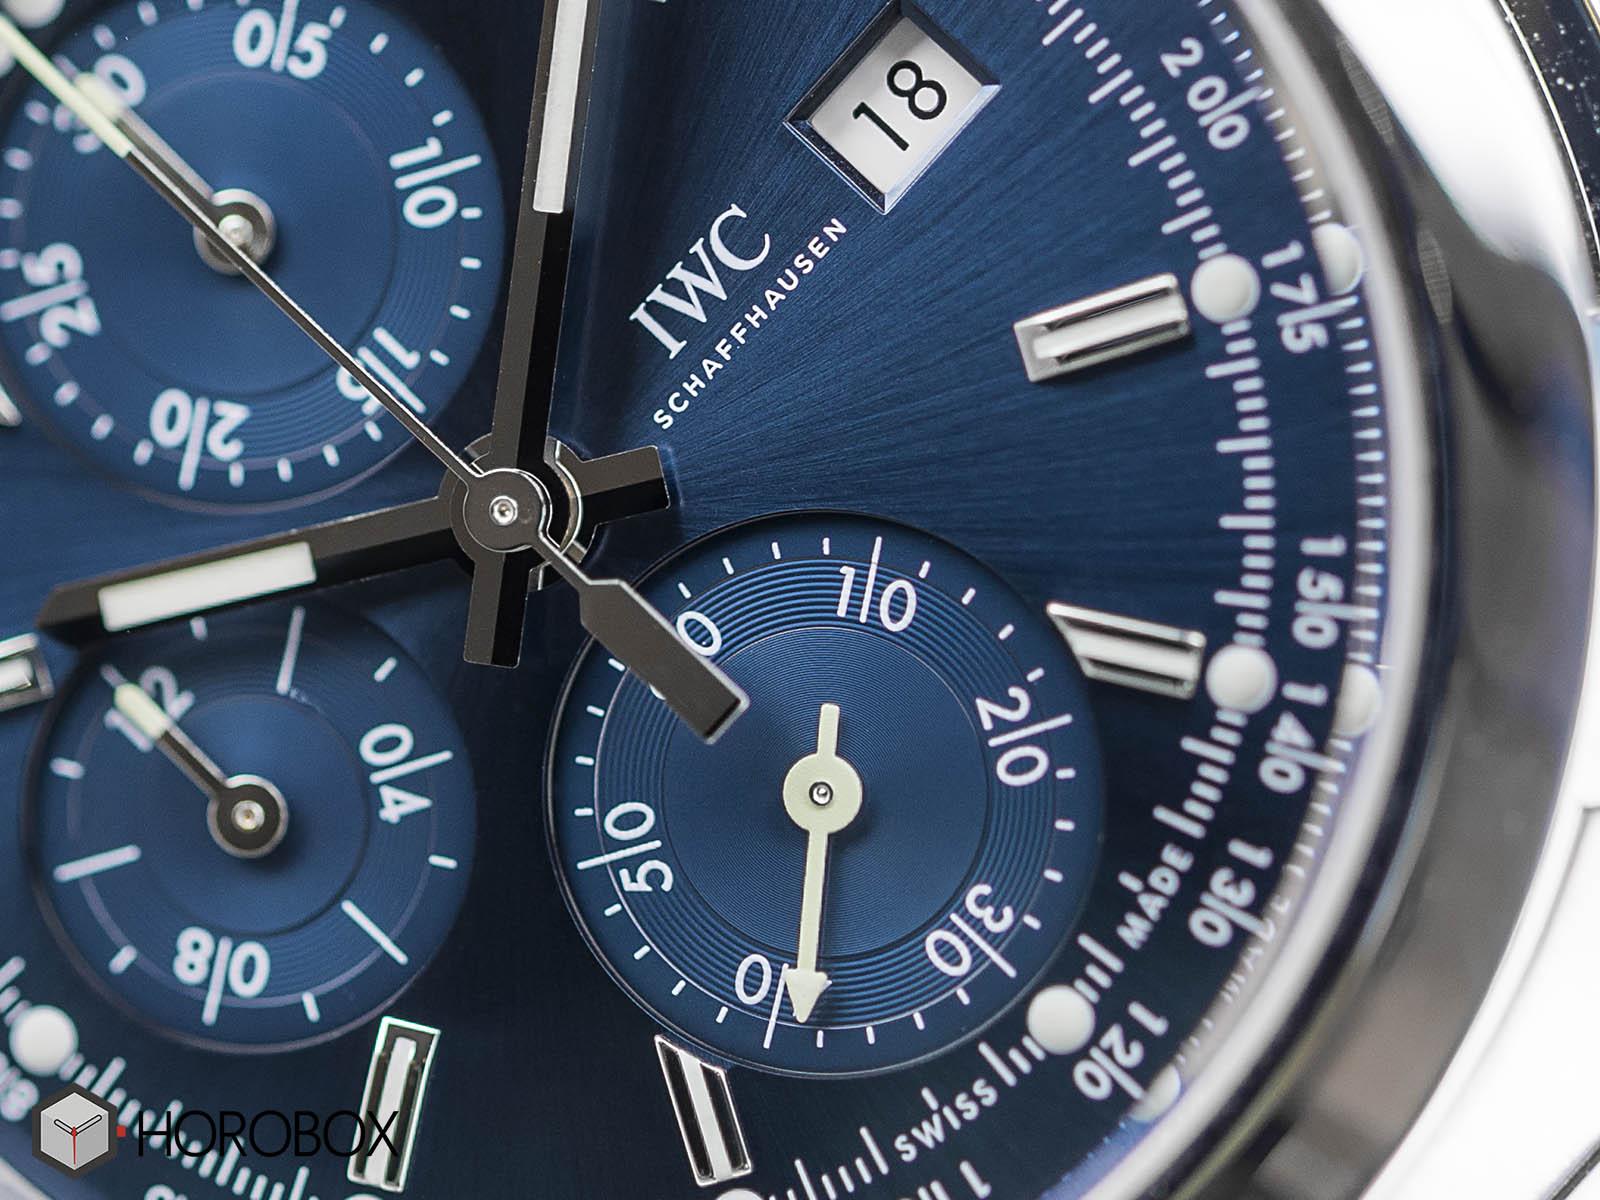 iwc-ingenieur-chronograph-W380802-3-.jpg